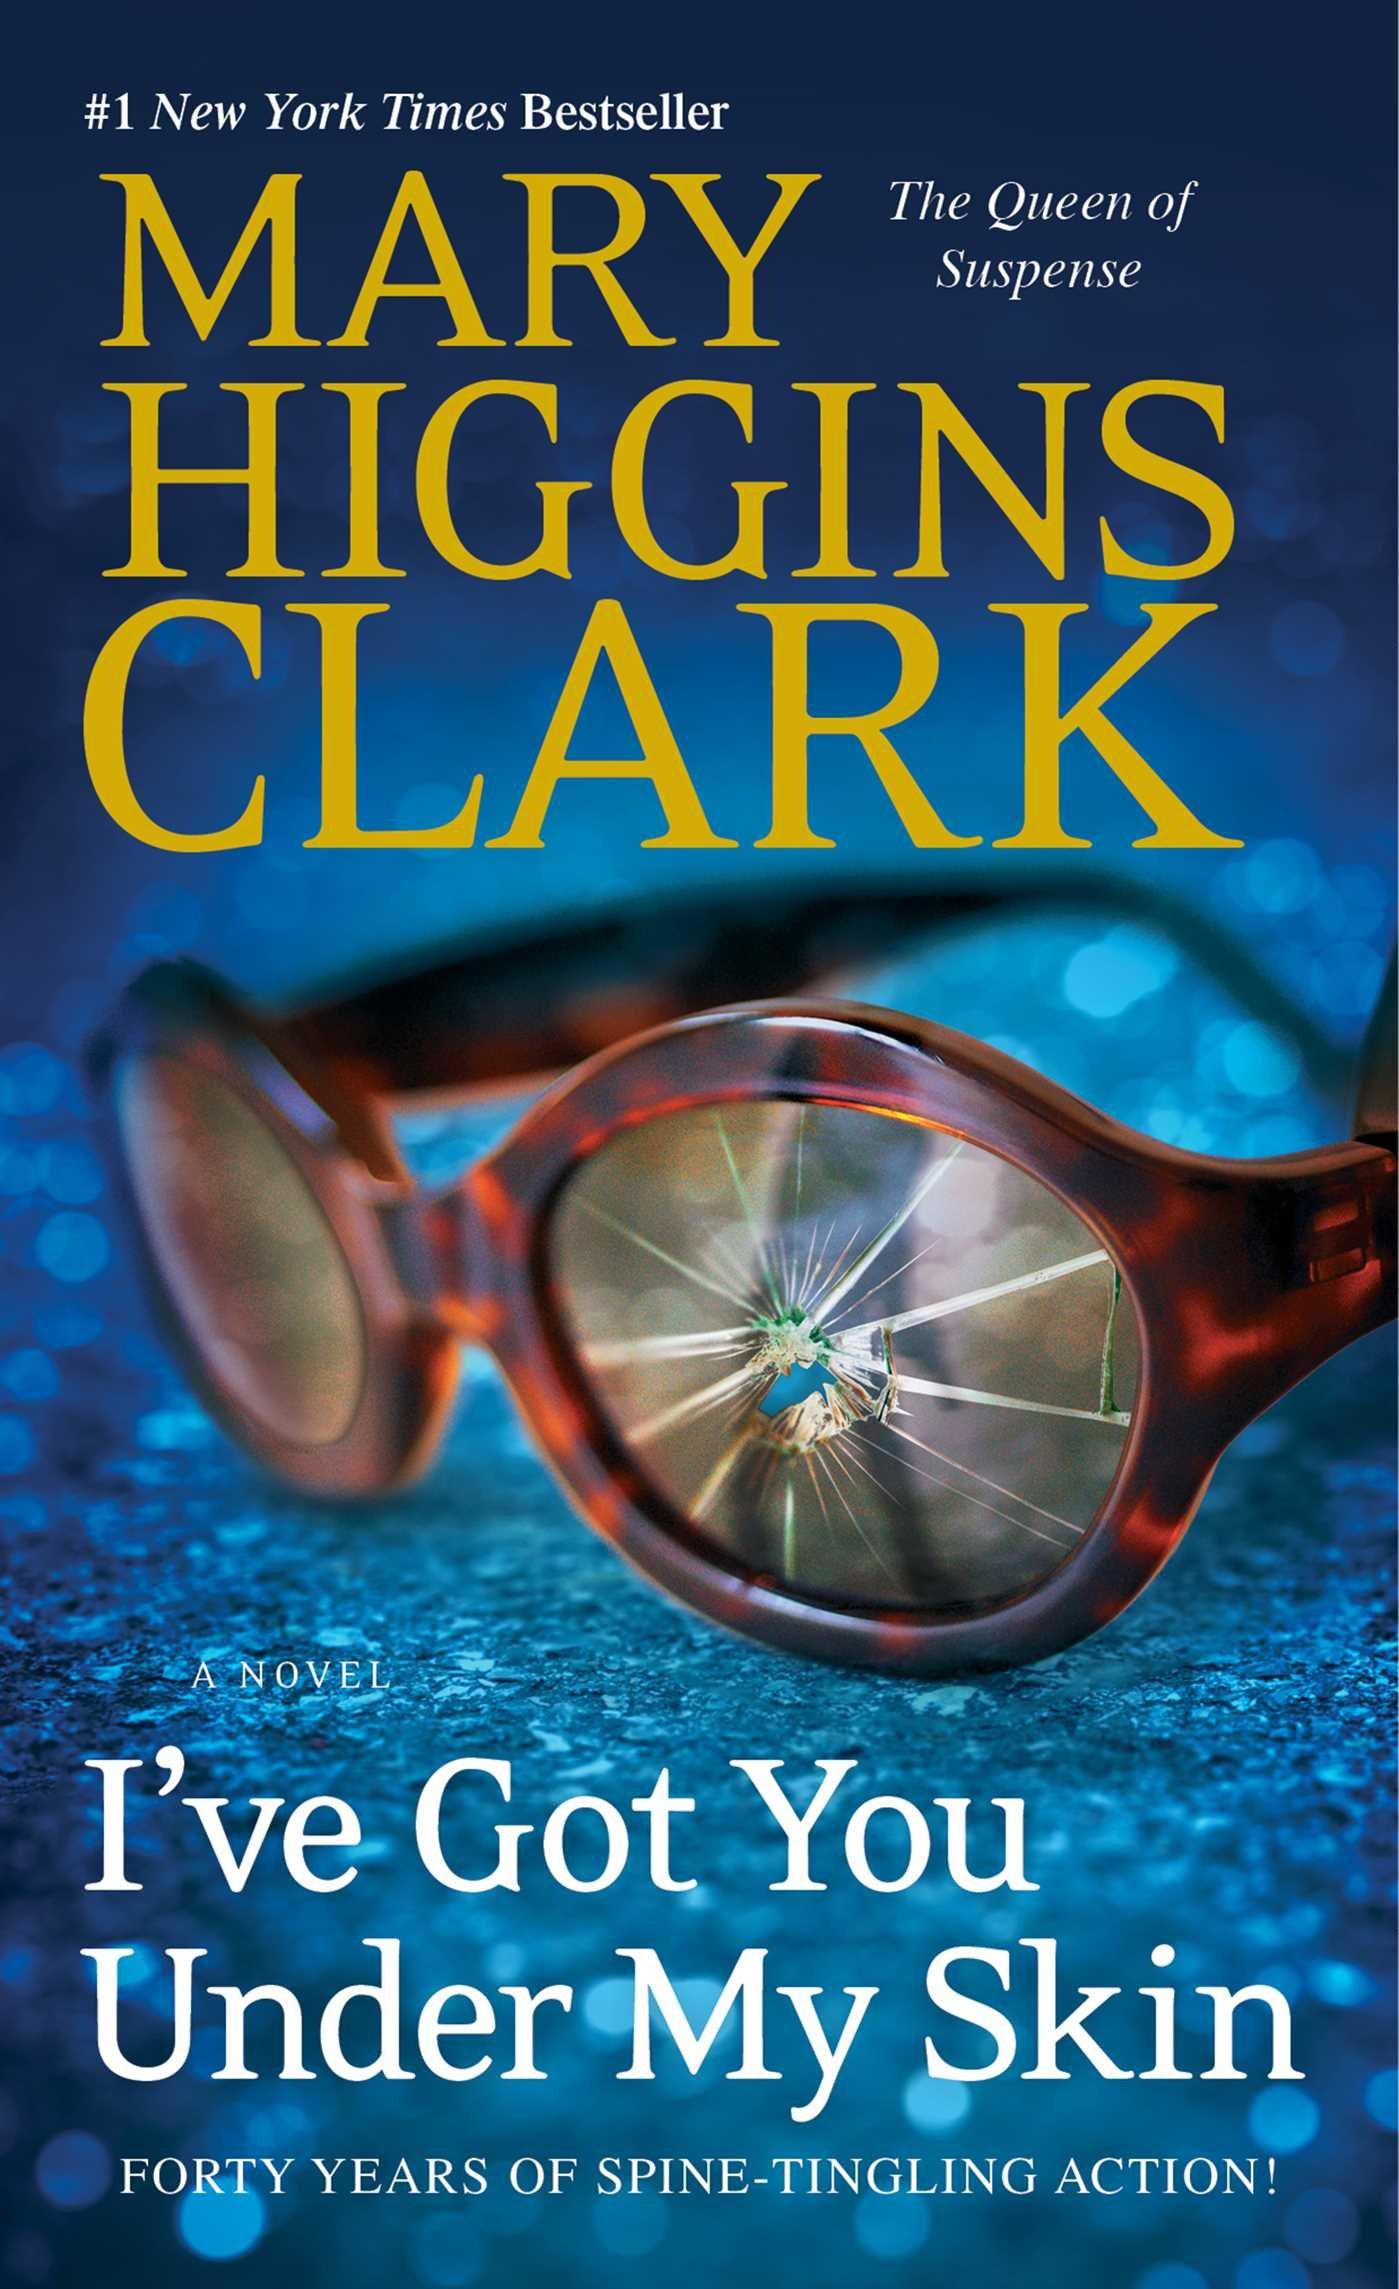 I Ve Got You Under My Skin A Novel 1 Under Suspicion 9781476749082 Clark Mary Higgins Books